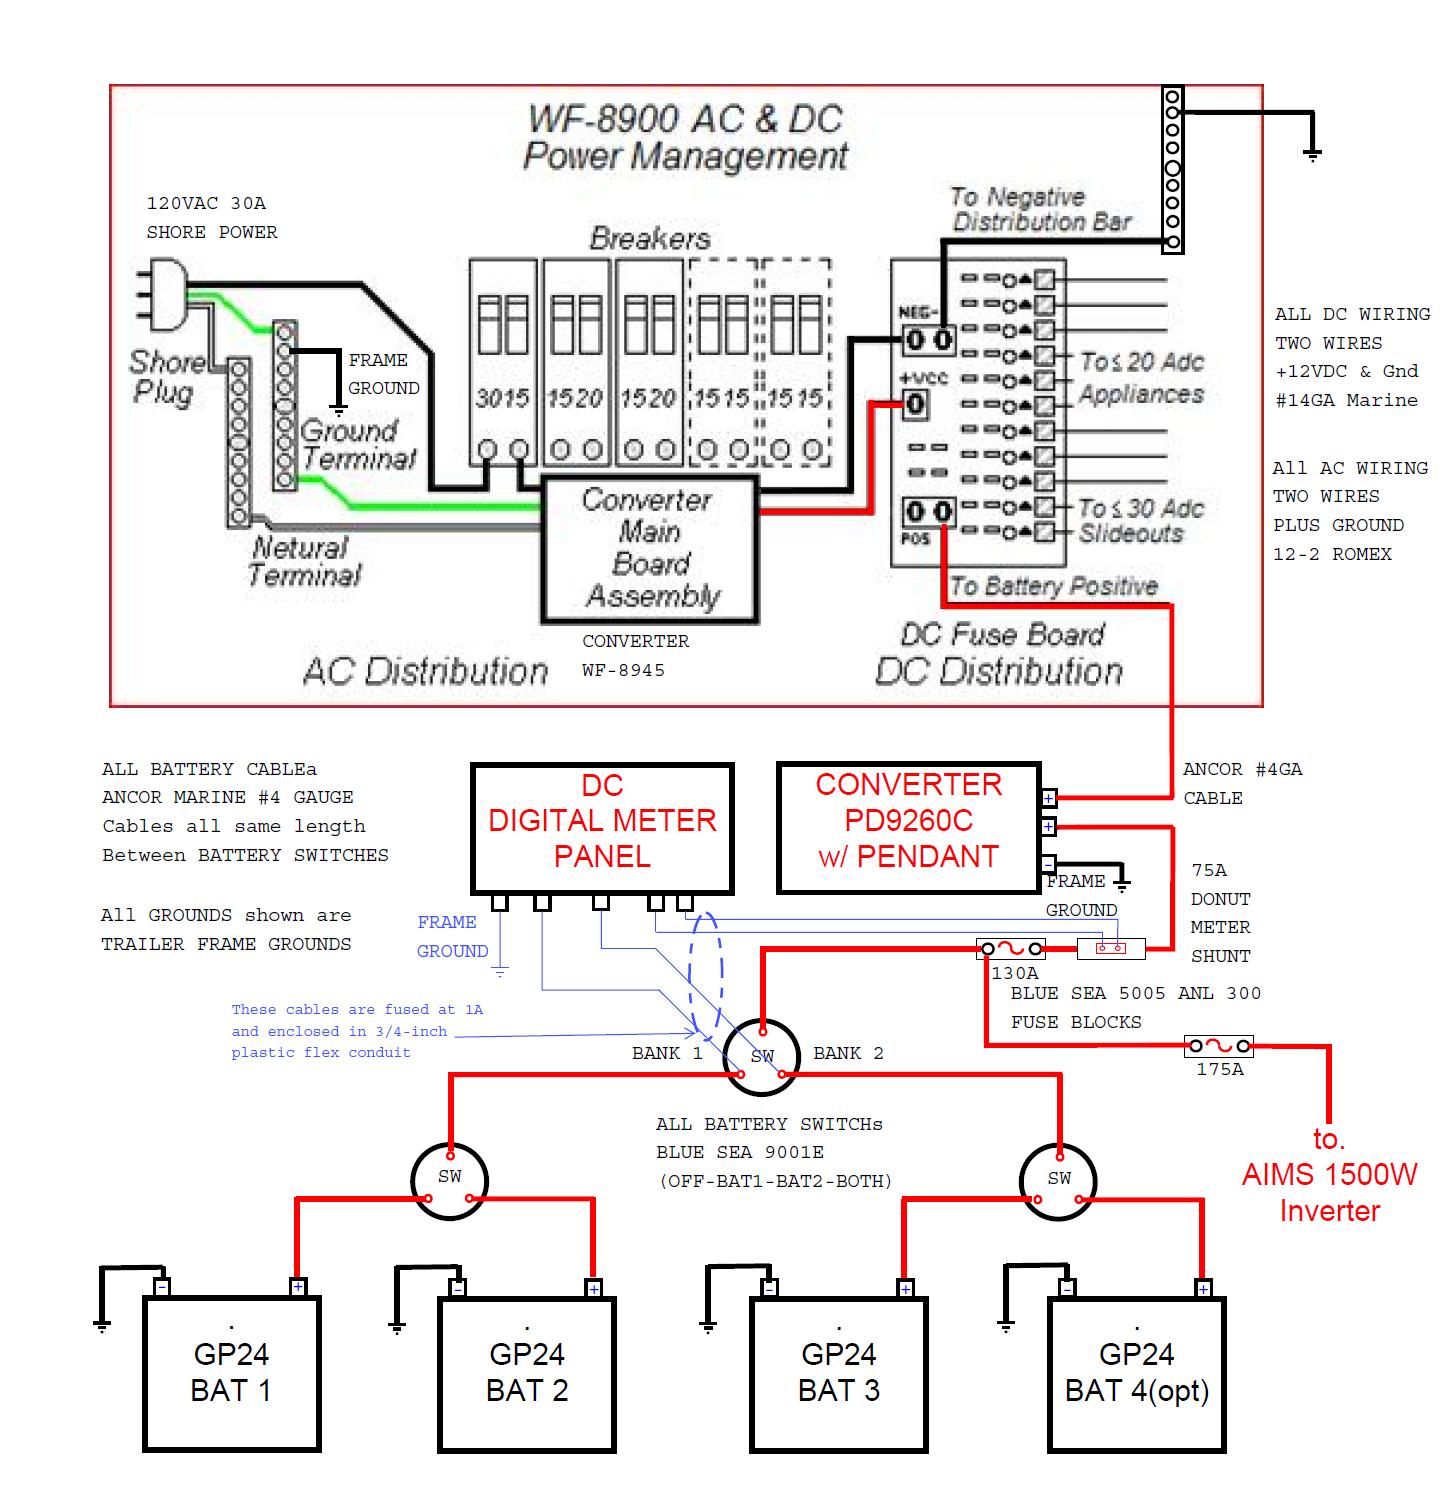 Power Converter Wiring Diagram | Wiring Diagram - Progressive Dynamics Power Converter Wiring Diagram